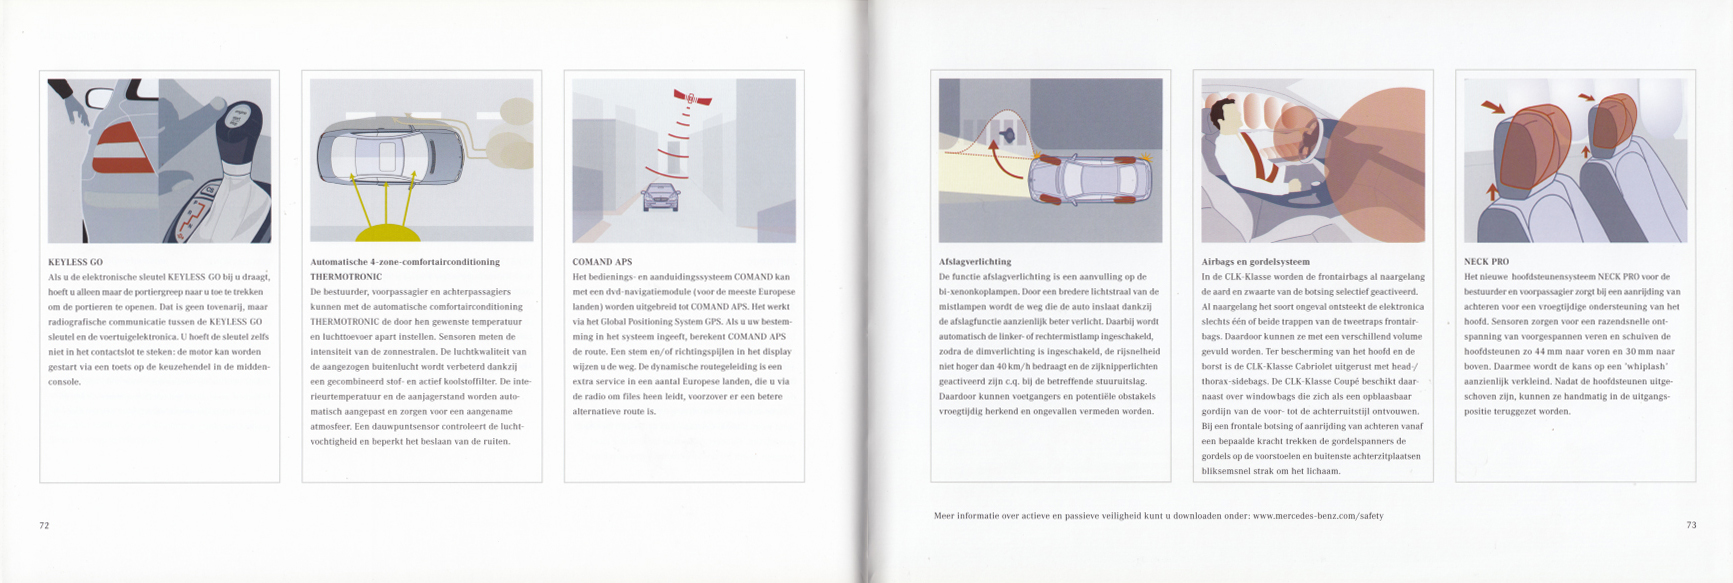 (A/C209): Catálogo 2006 - neerlandês 037